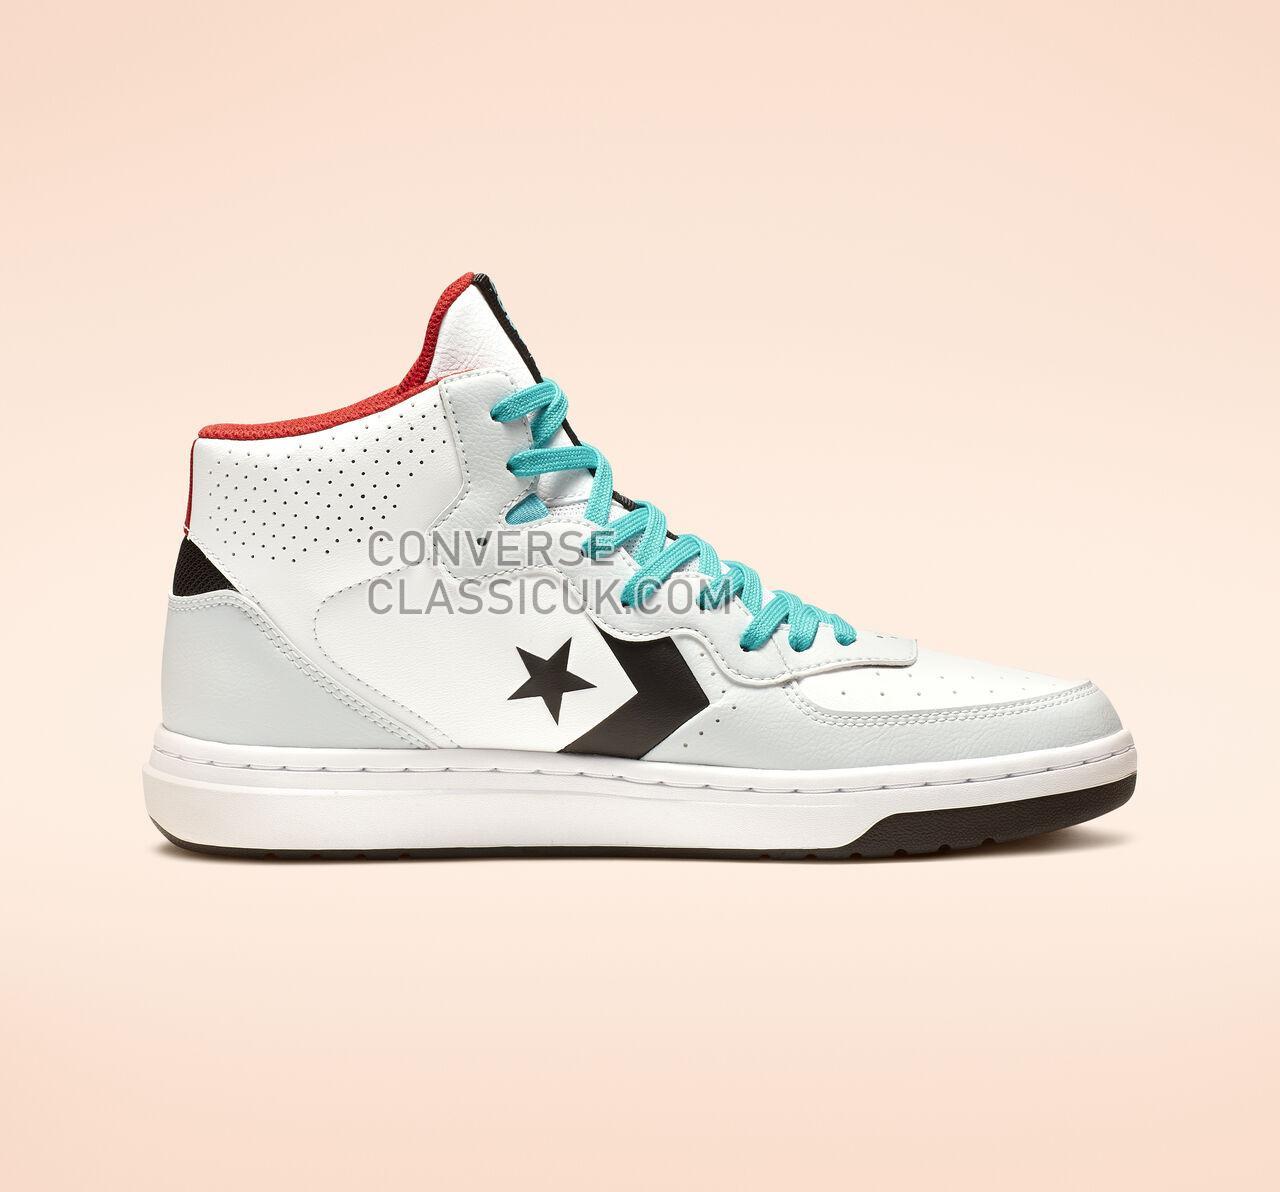 Converse Rival Mid Mens Womens Unisex 164892C White/Black/Pure Platinum Shoes